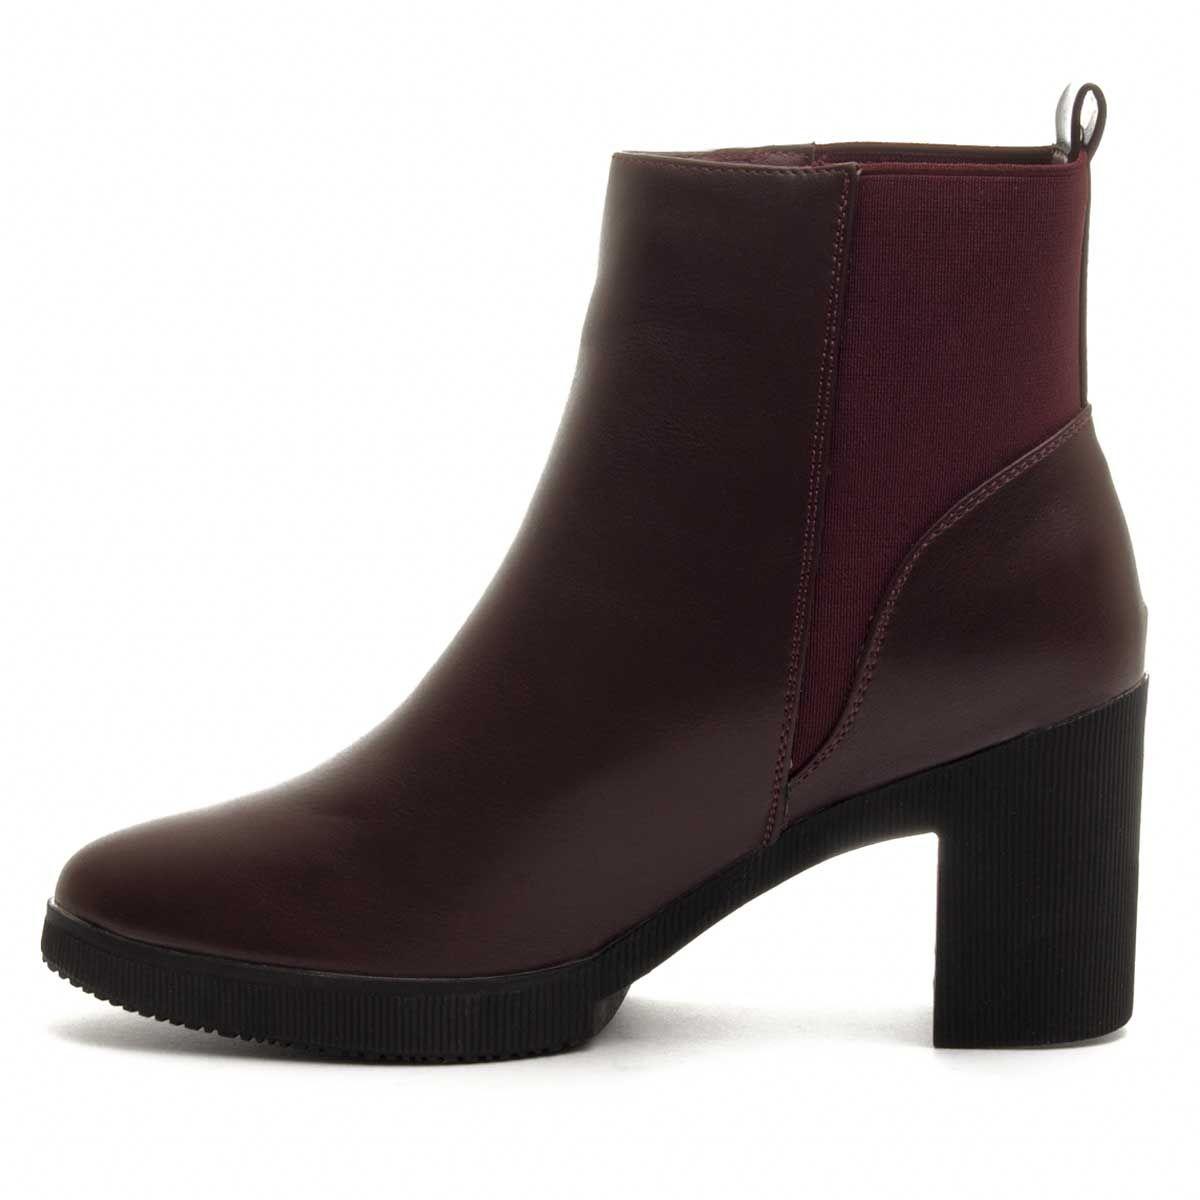 Montevita Heeled Ankle Boot in Bordo